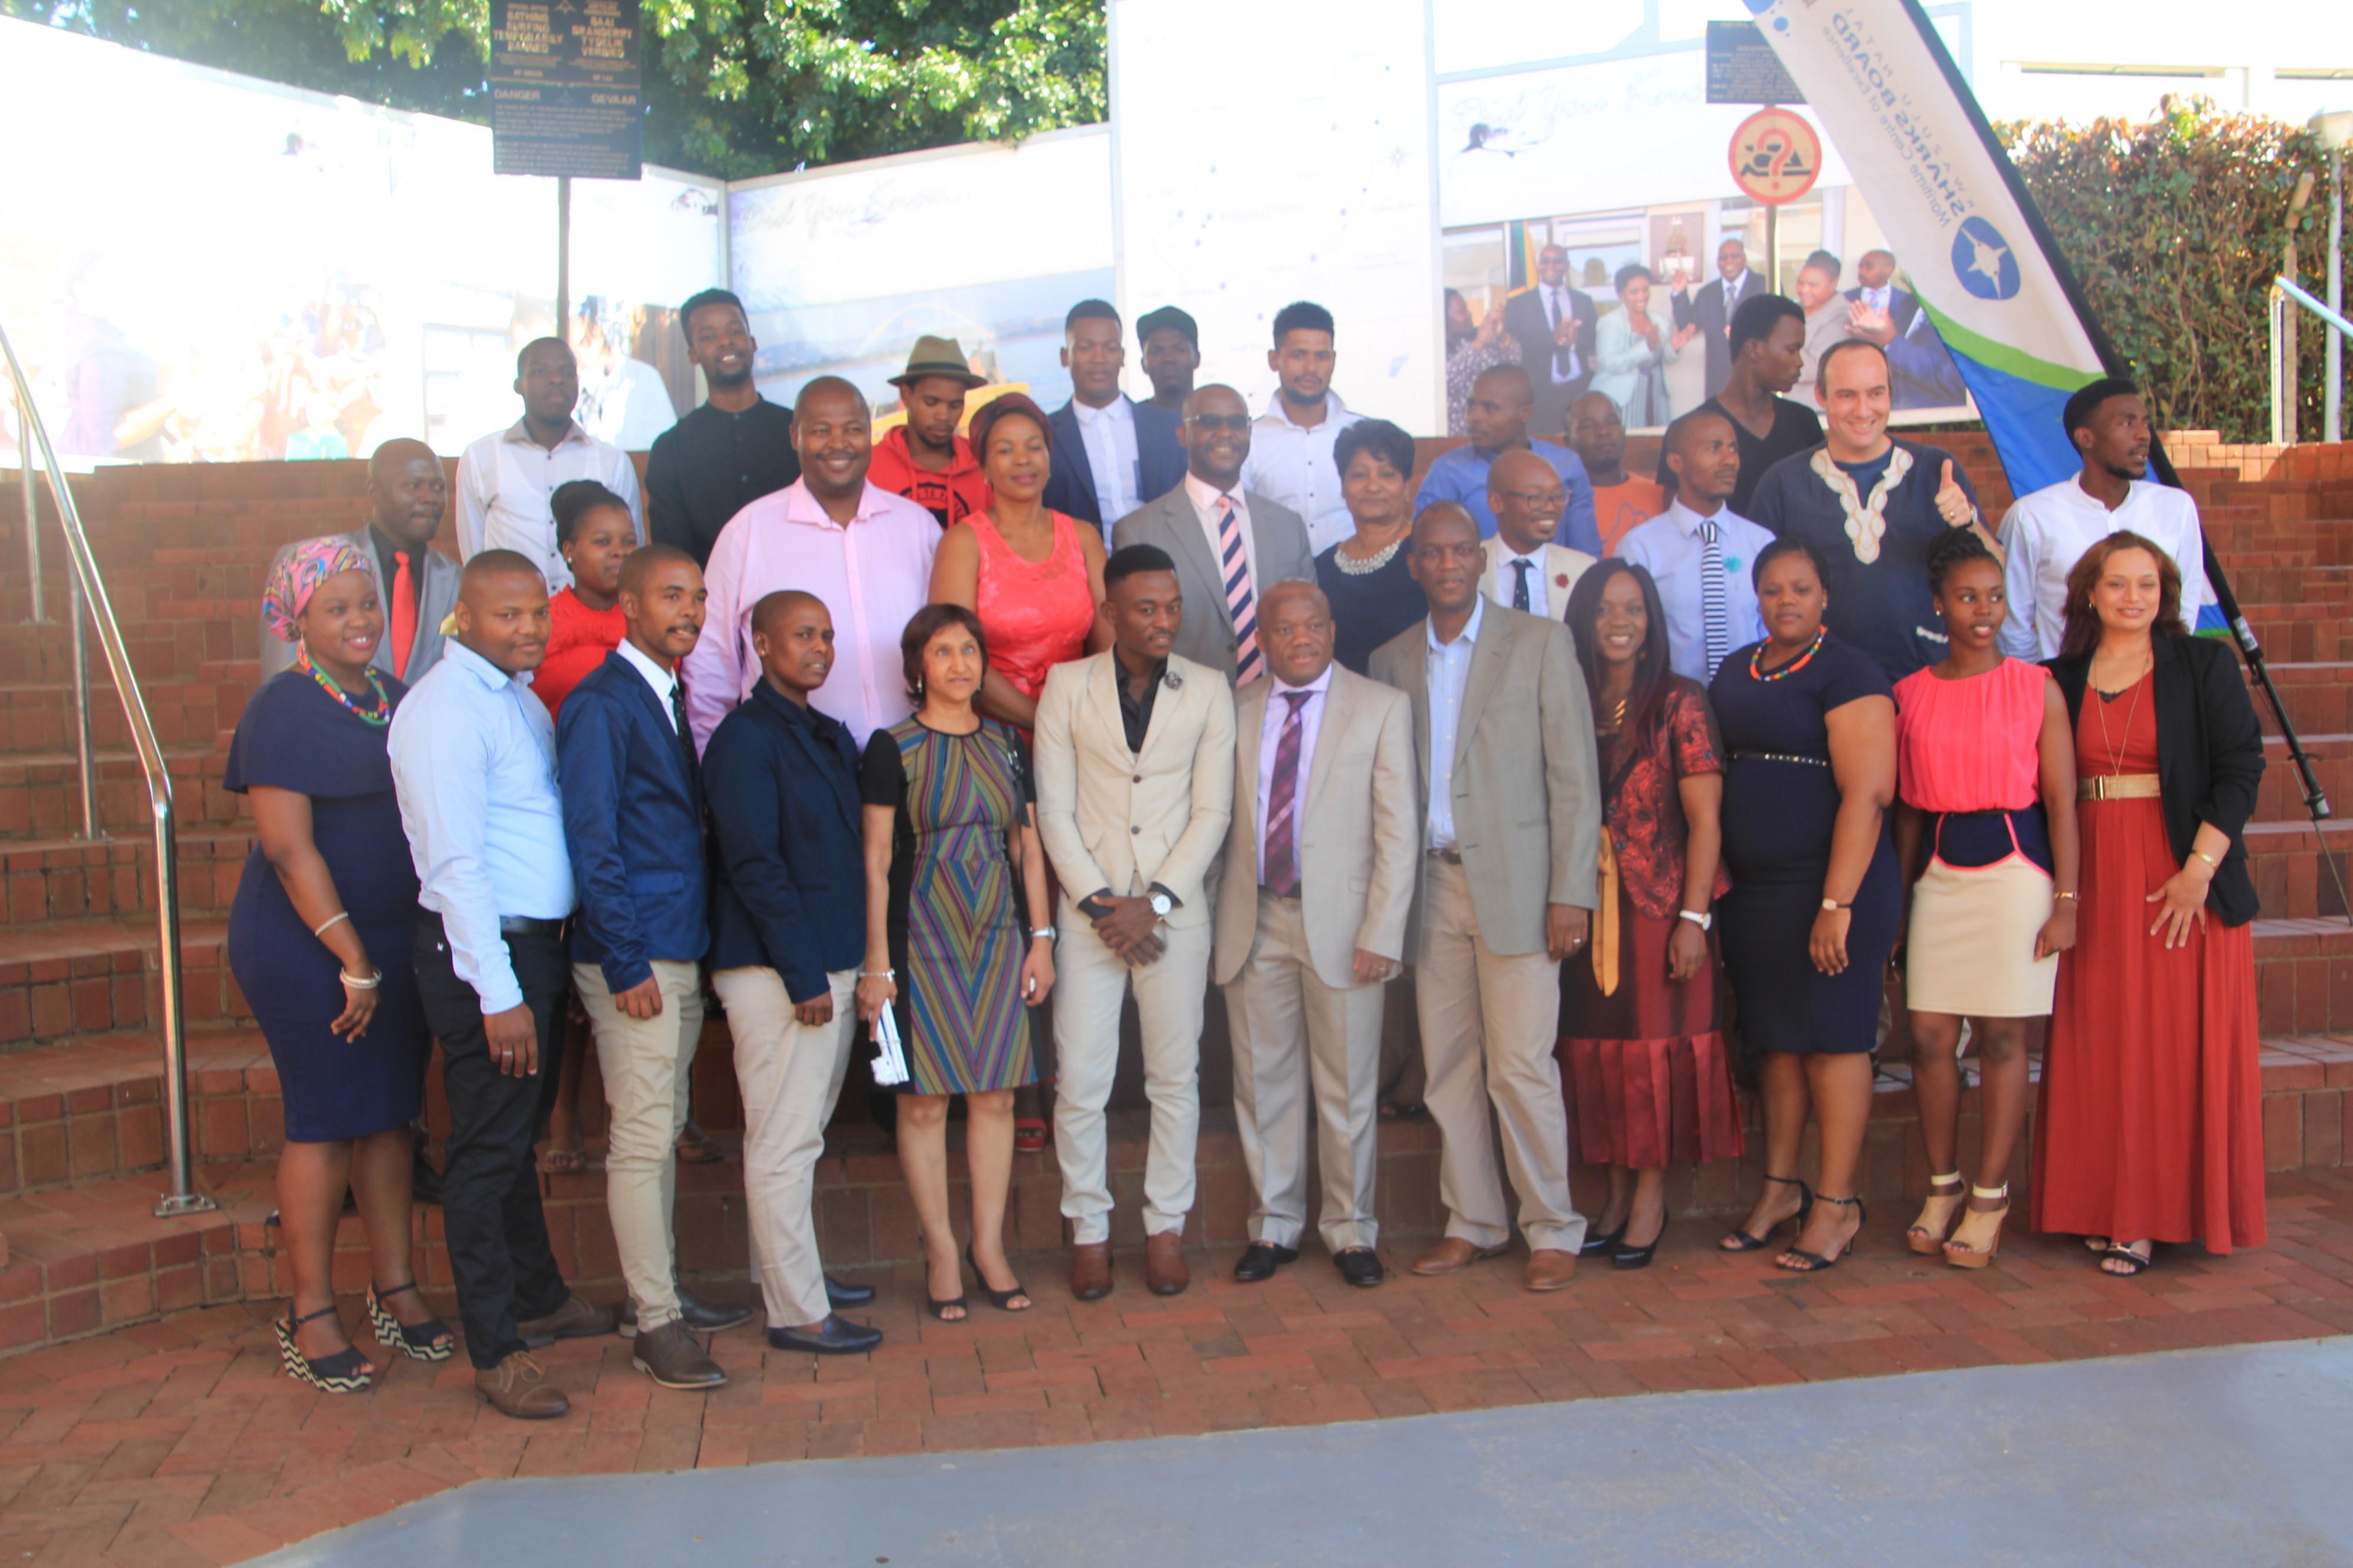 KwaZulu-Natal Sharks Board Official Website